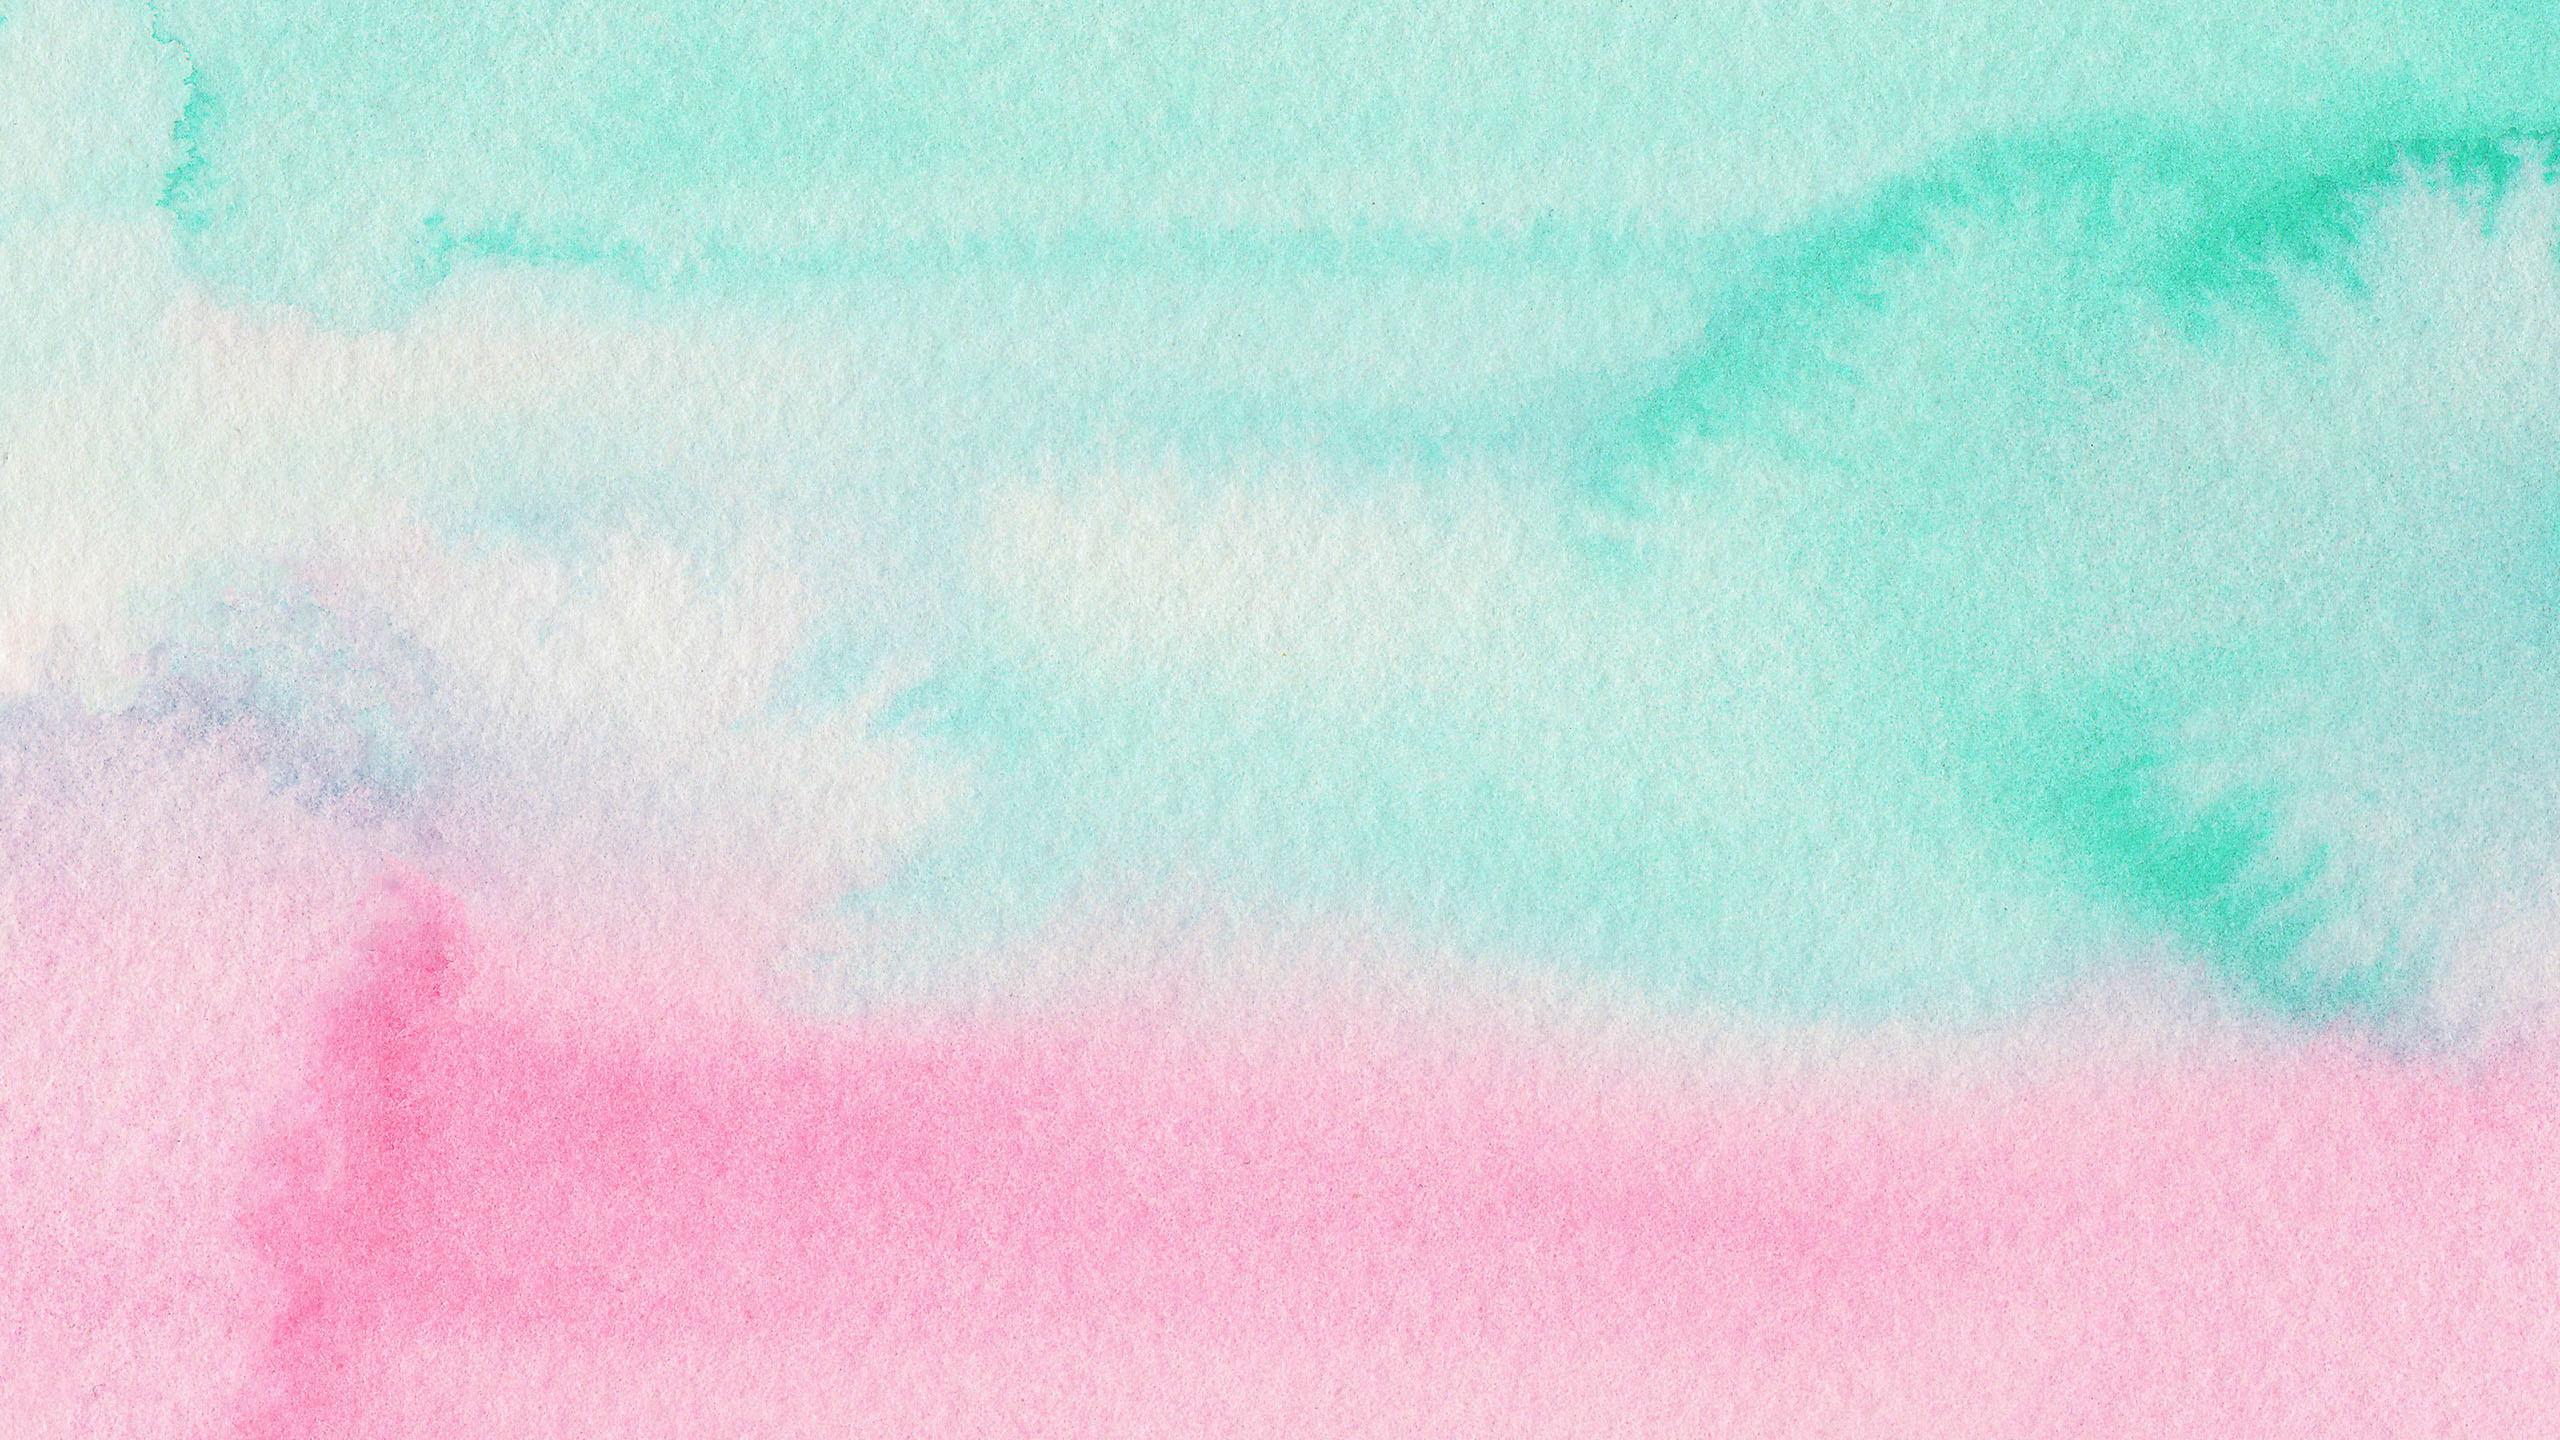 Free wallpaper // 005